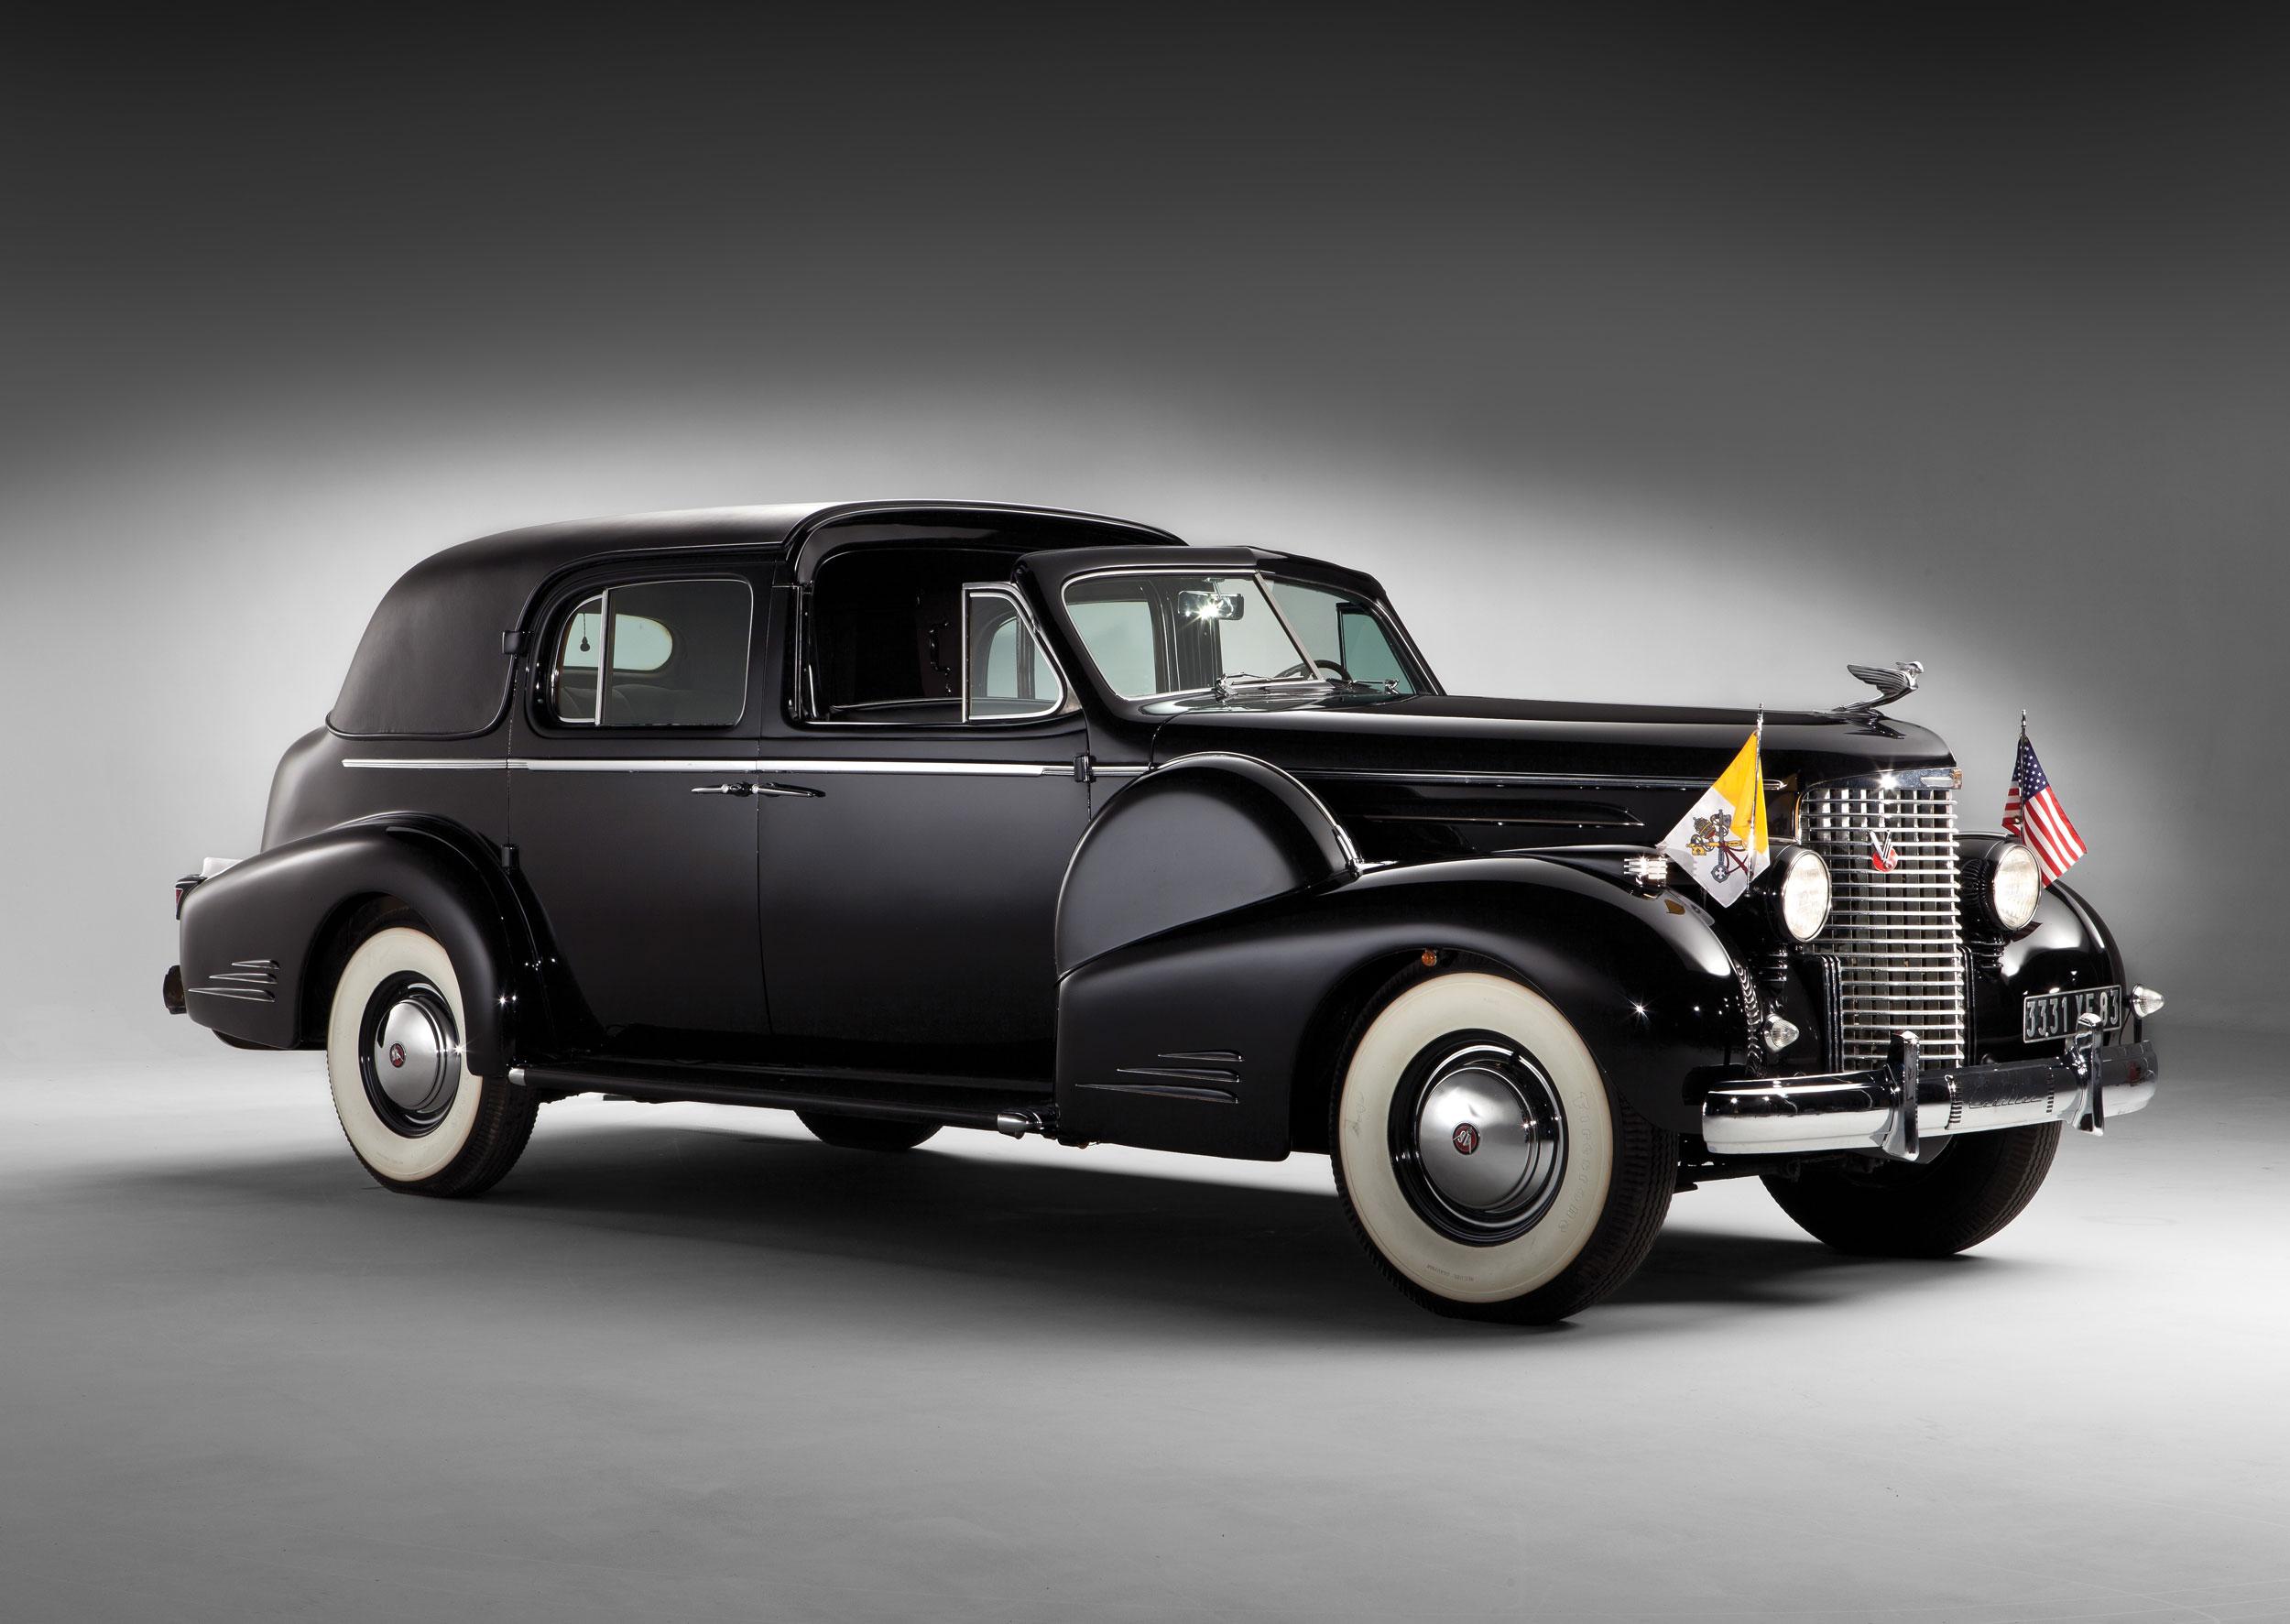 1938 Cadillac Sixteen Town Car by Fleetwood